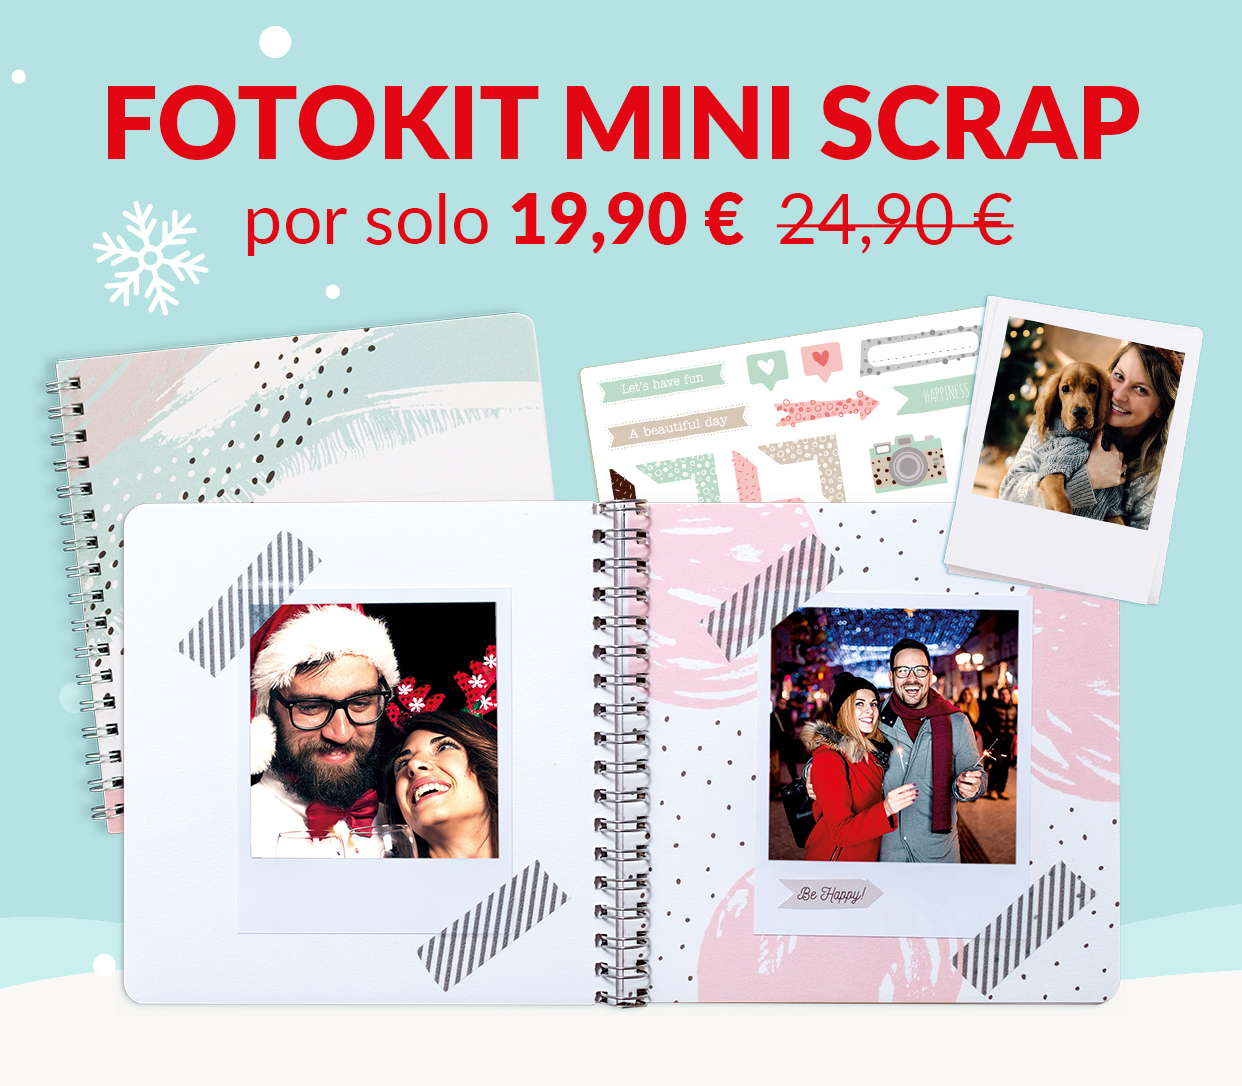 FotoKit Mini Scrap por solo 19,90 € en lugar de 24,90 €